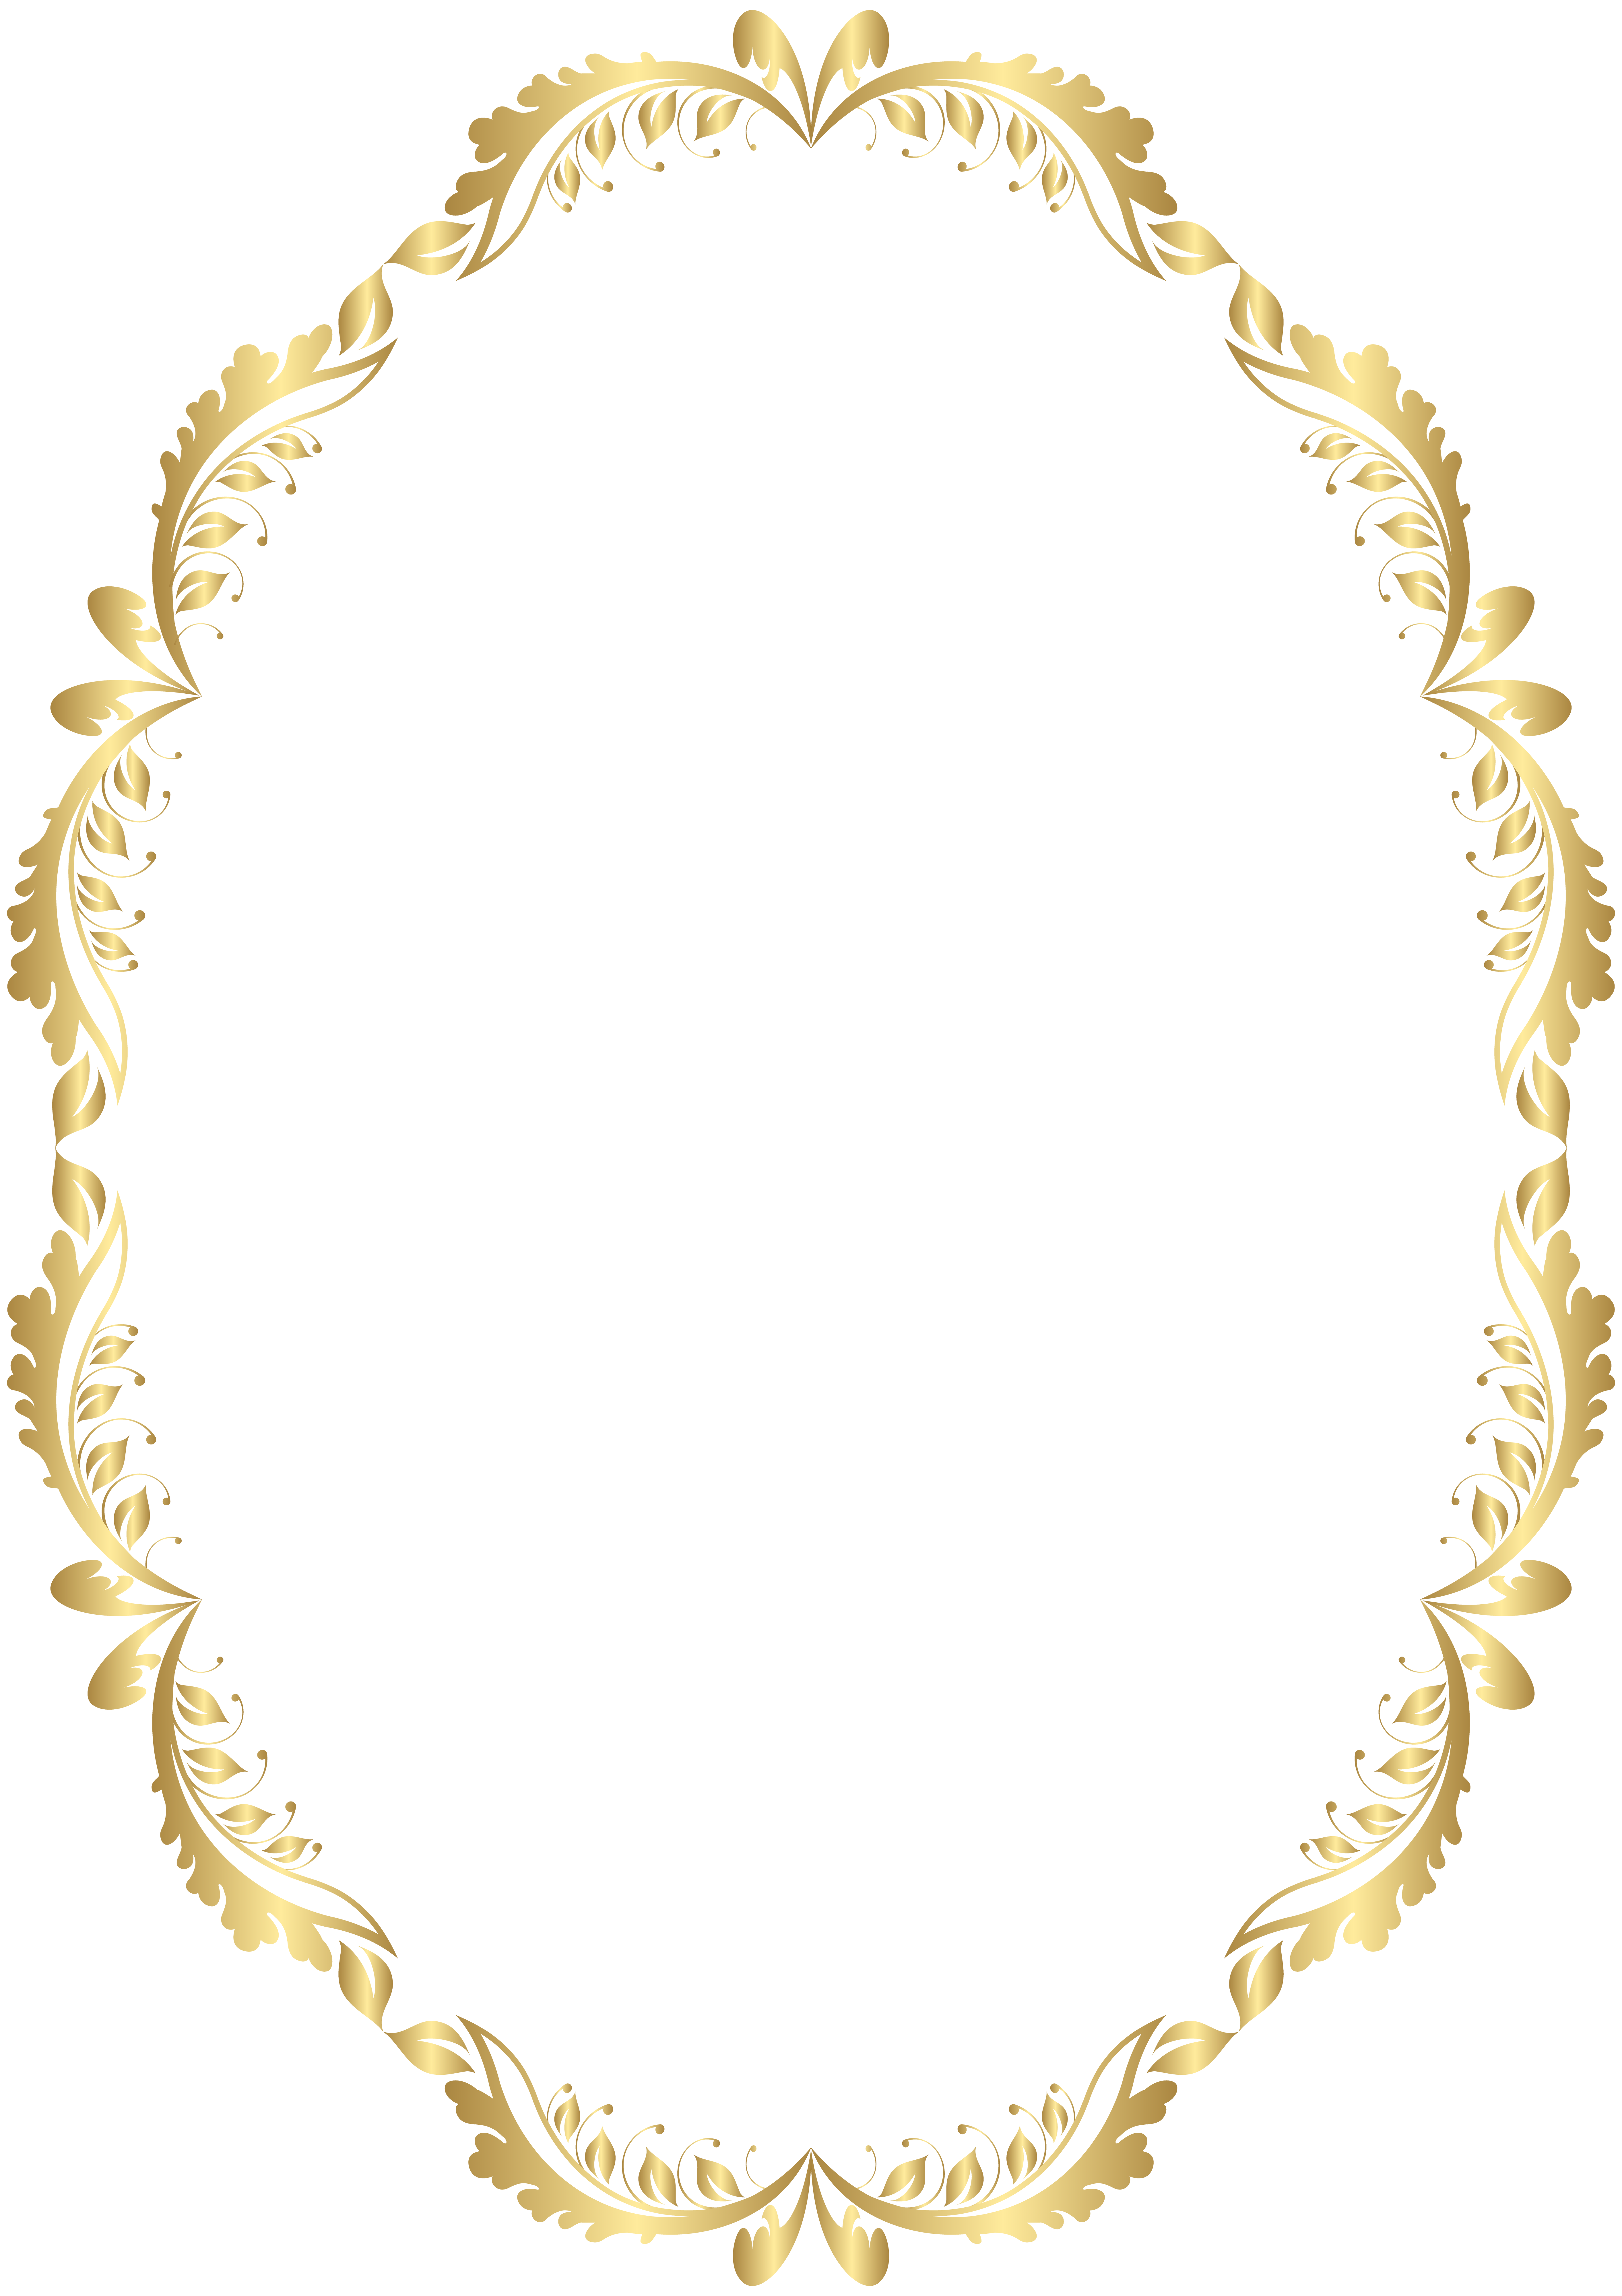 Gold crown clipart black border image royalty free stock Golden Oval Border Transparent PNG Clip Art | anandhakumar ... image royalty free stock